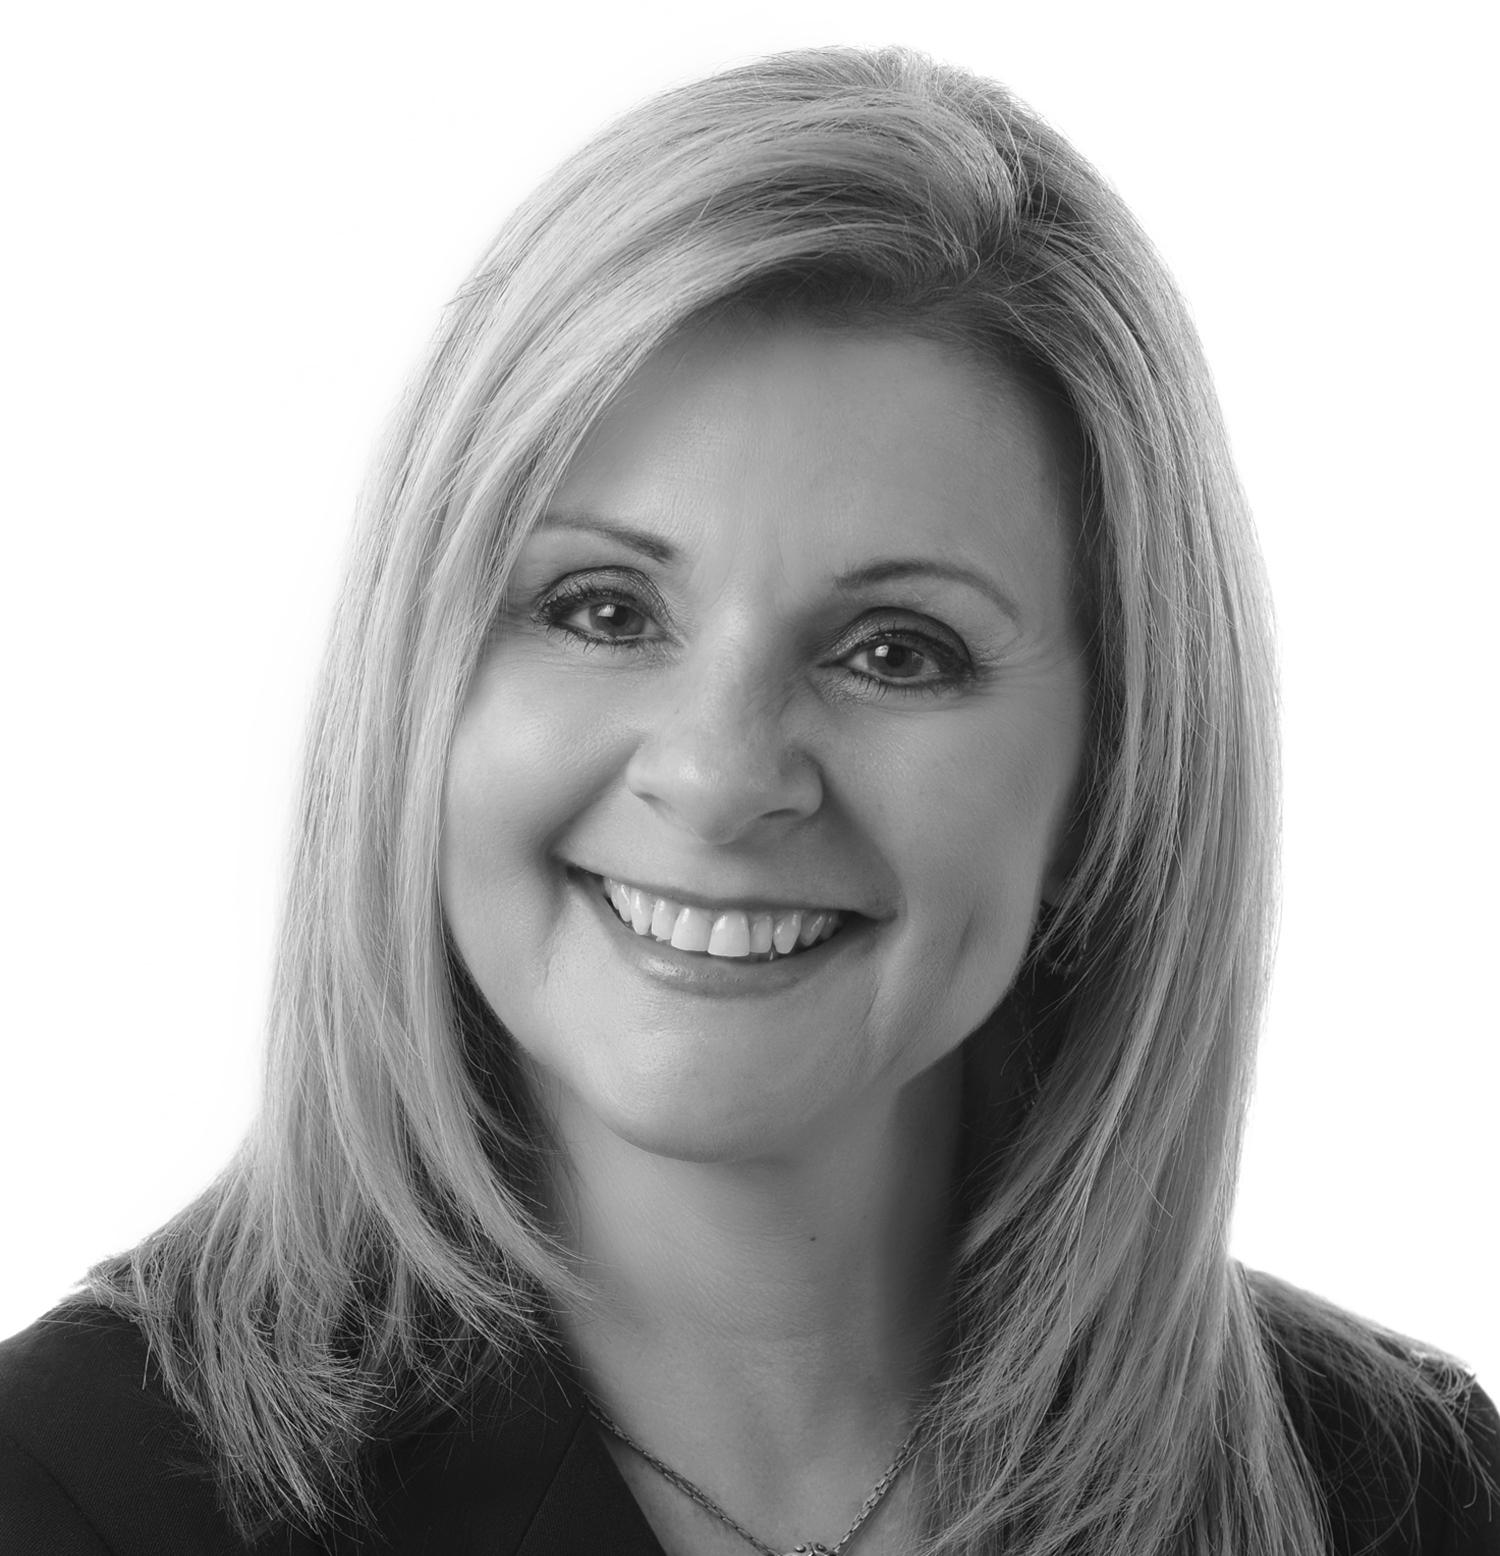 Cheryl Daugherty